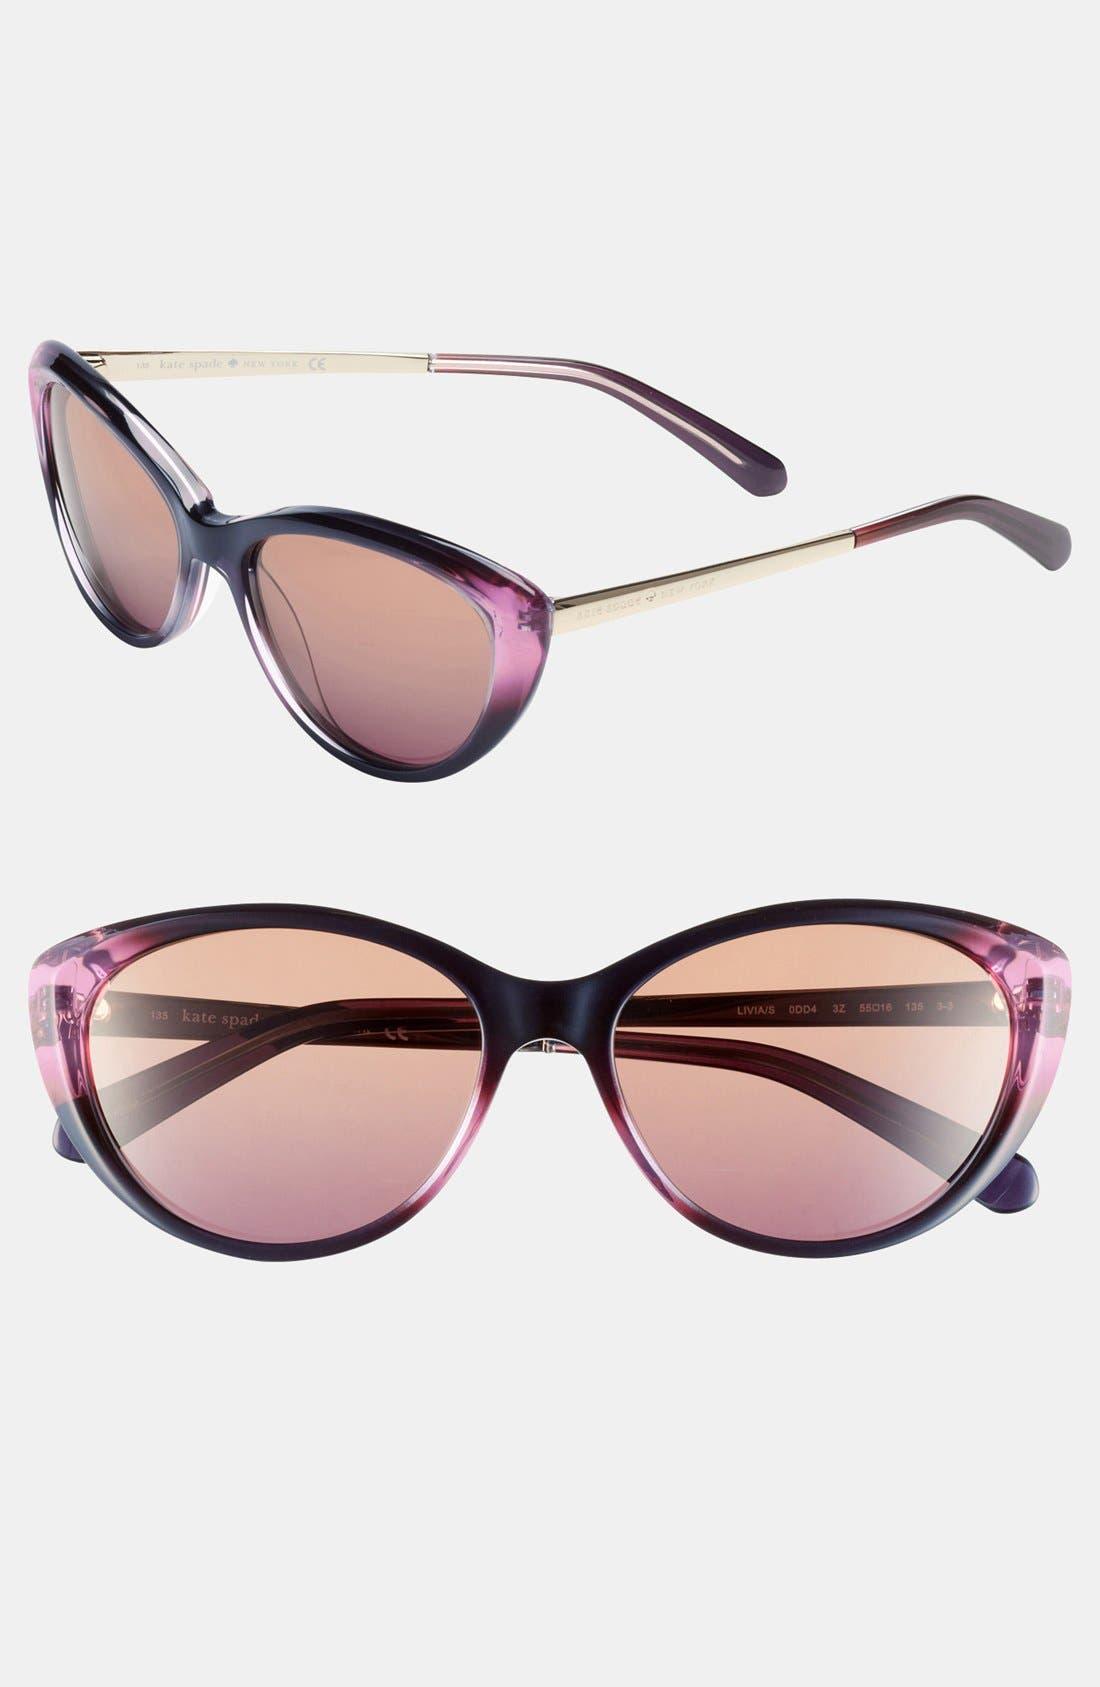 Main Image - kate spade new york 'livia' 55mm sunglasses